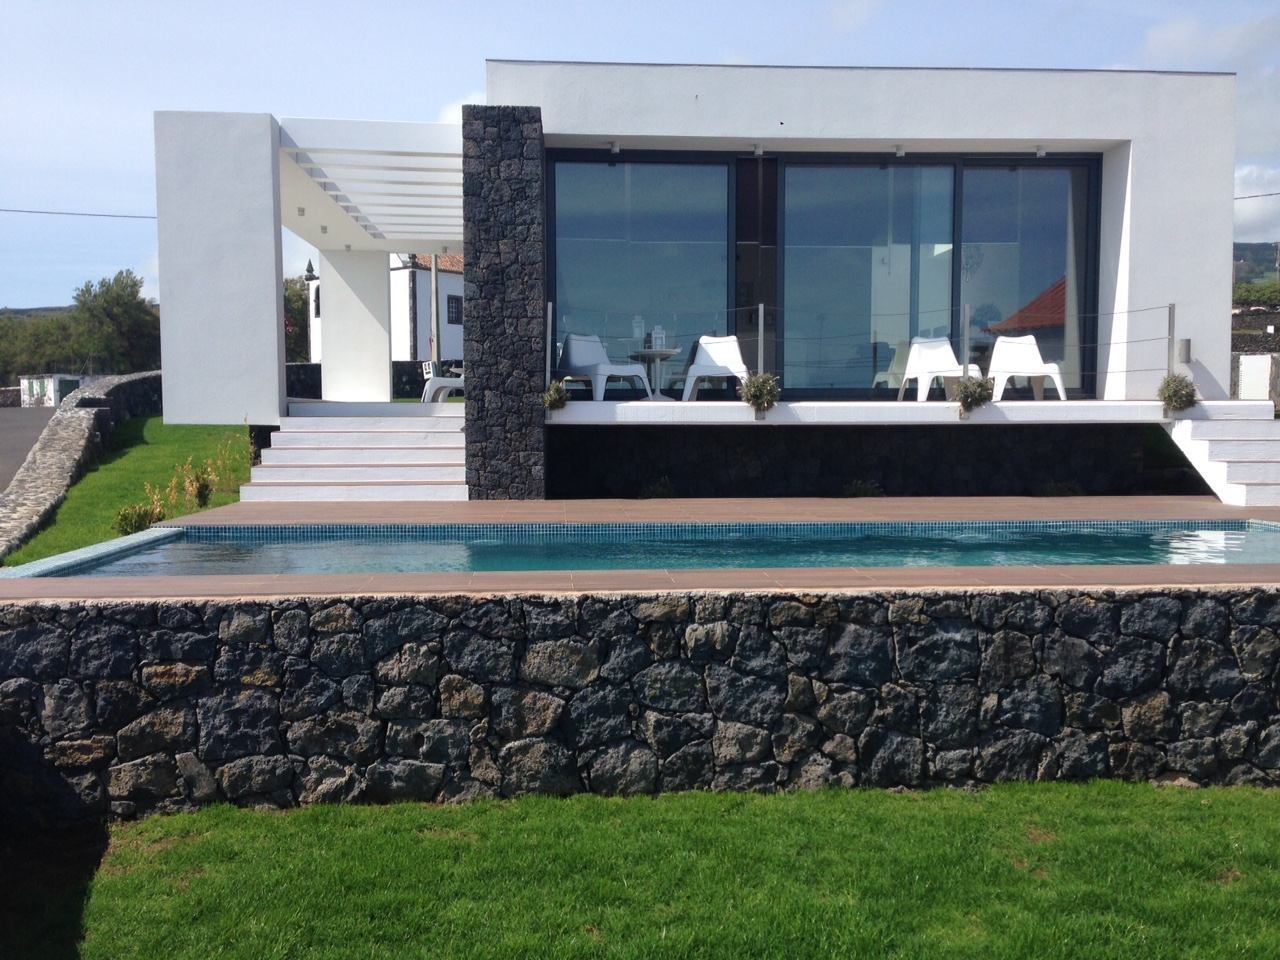 Casa das Cinco_Terrasse mit Pool 2